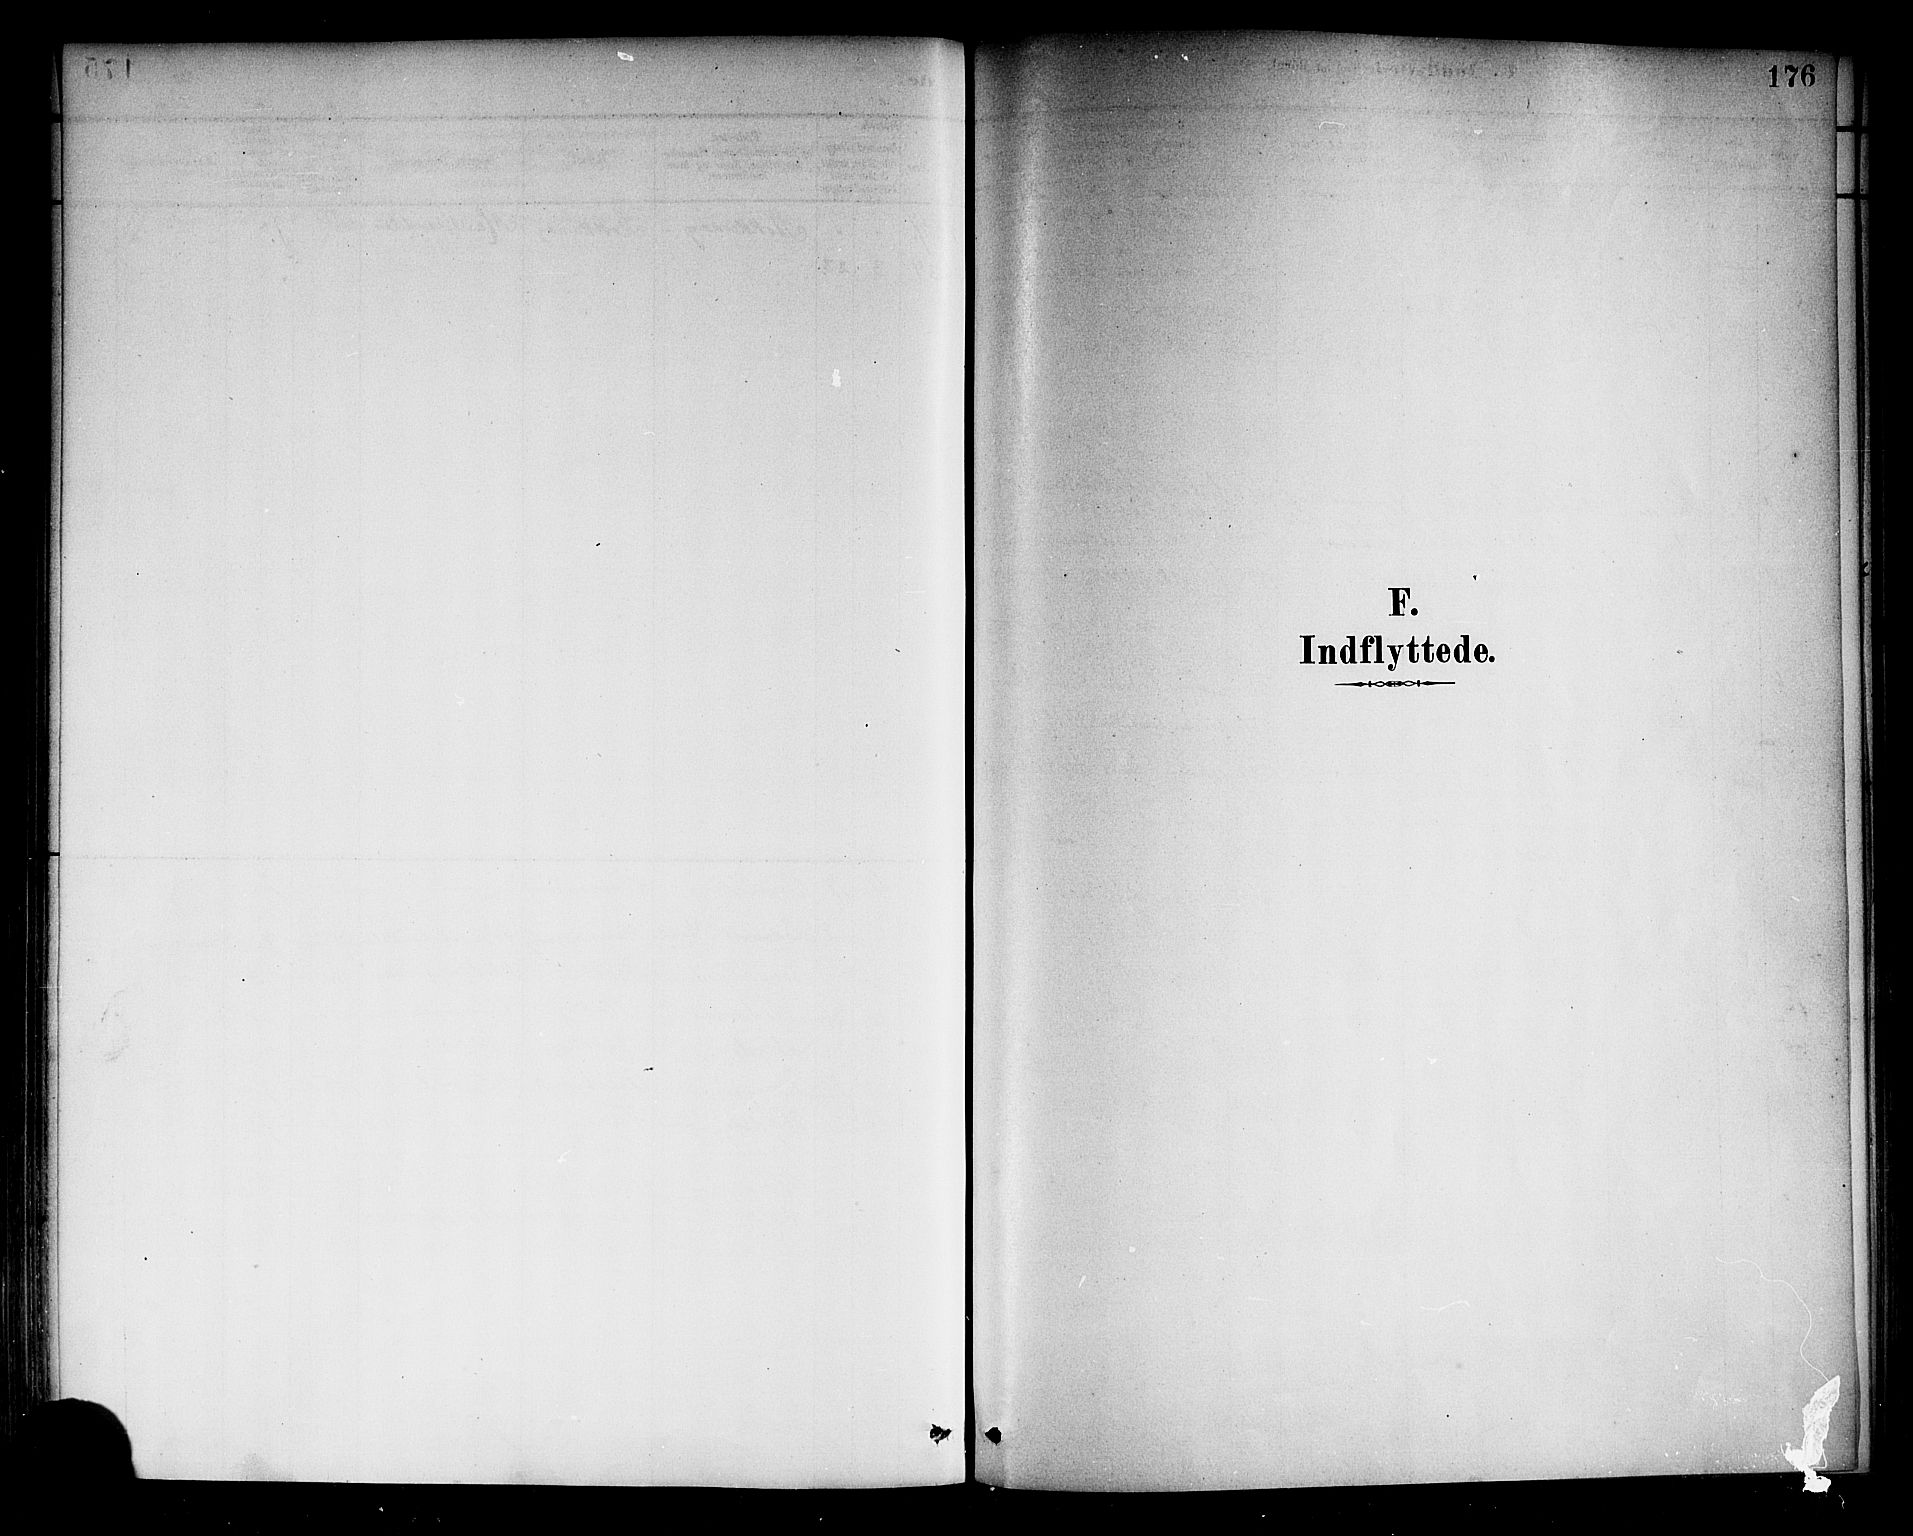 SAB, Selje sokneprestembete*, Ministerialbok nr. B 1, 1881-1890, s. 176